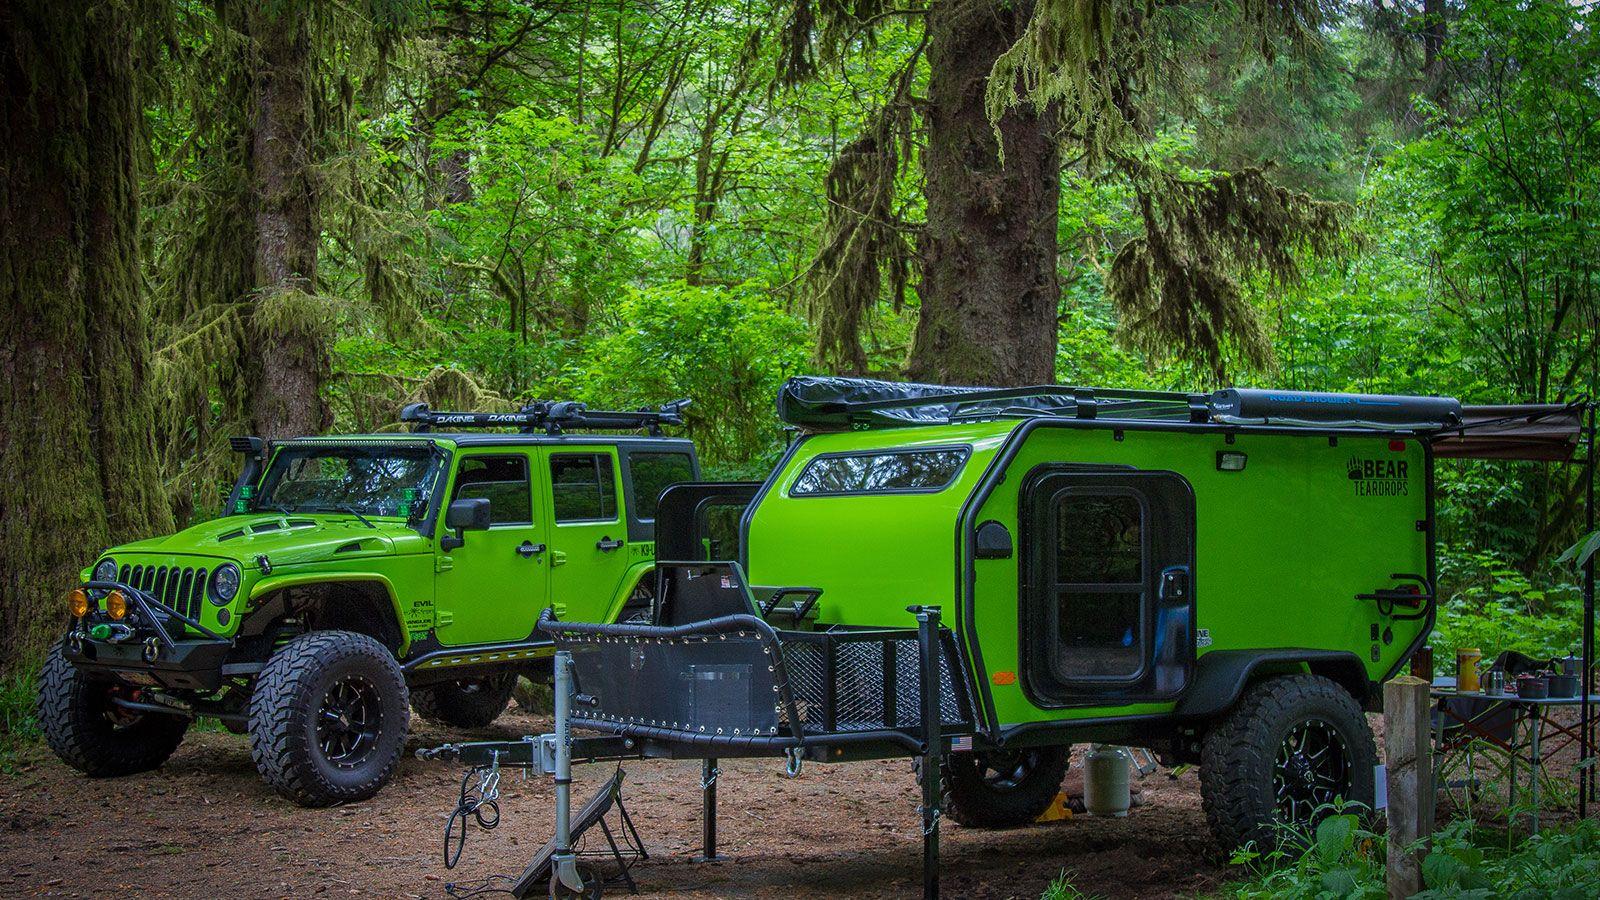 The Apache Trailer | Off road camper trailer, Off road ...